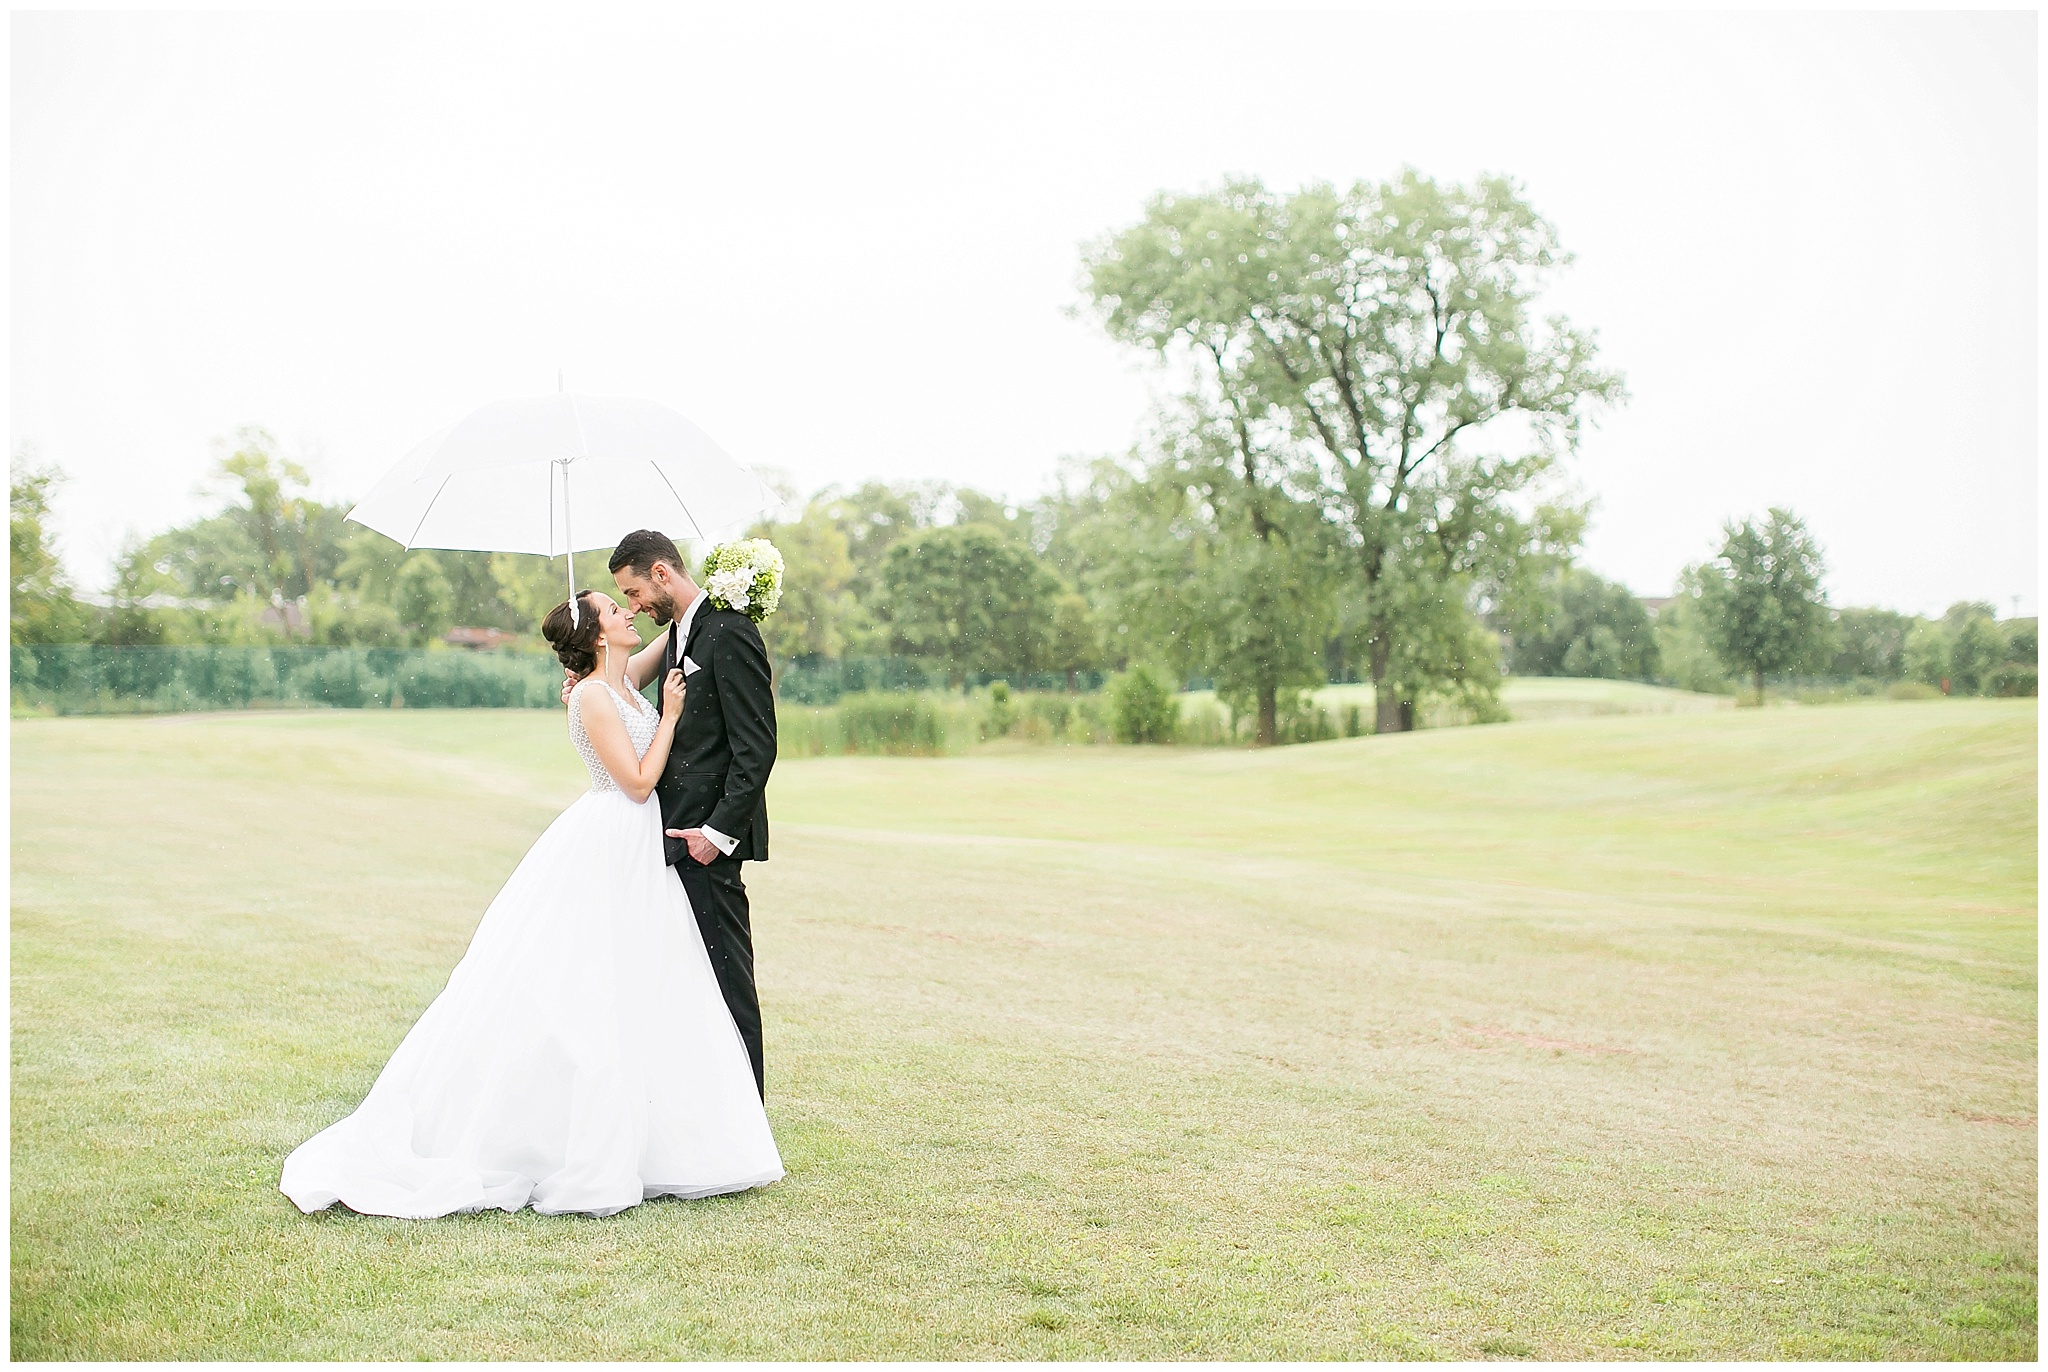 bridgewood_resort_wedding_neenah_wisconsin_0327.jpg